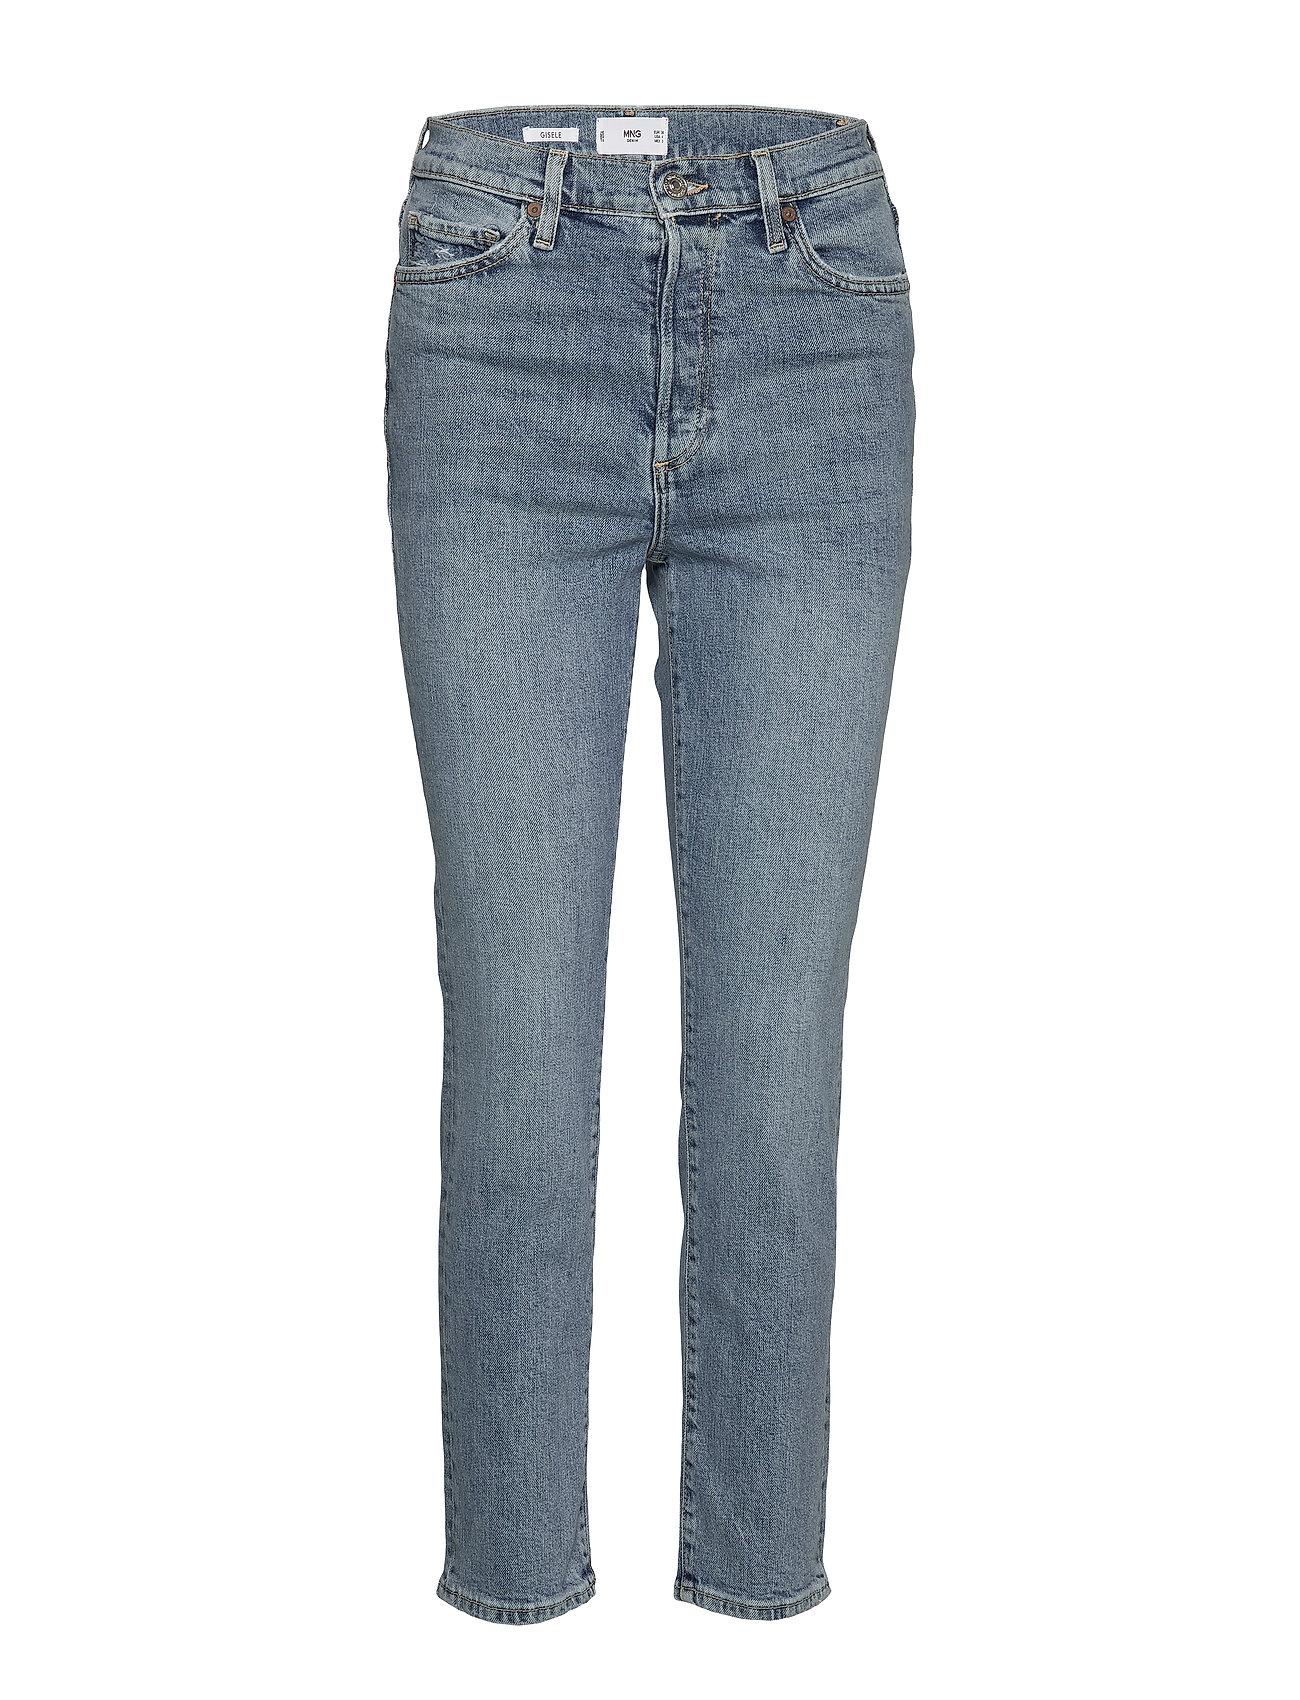 Mango Jeans high waist slim Gisele - OPEN BLUE